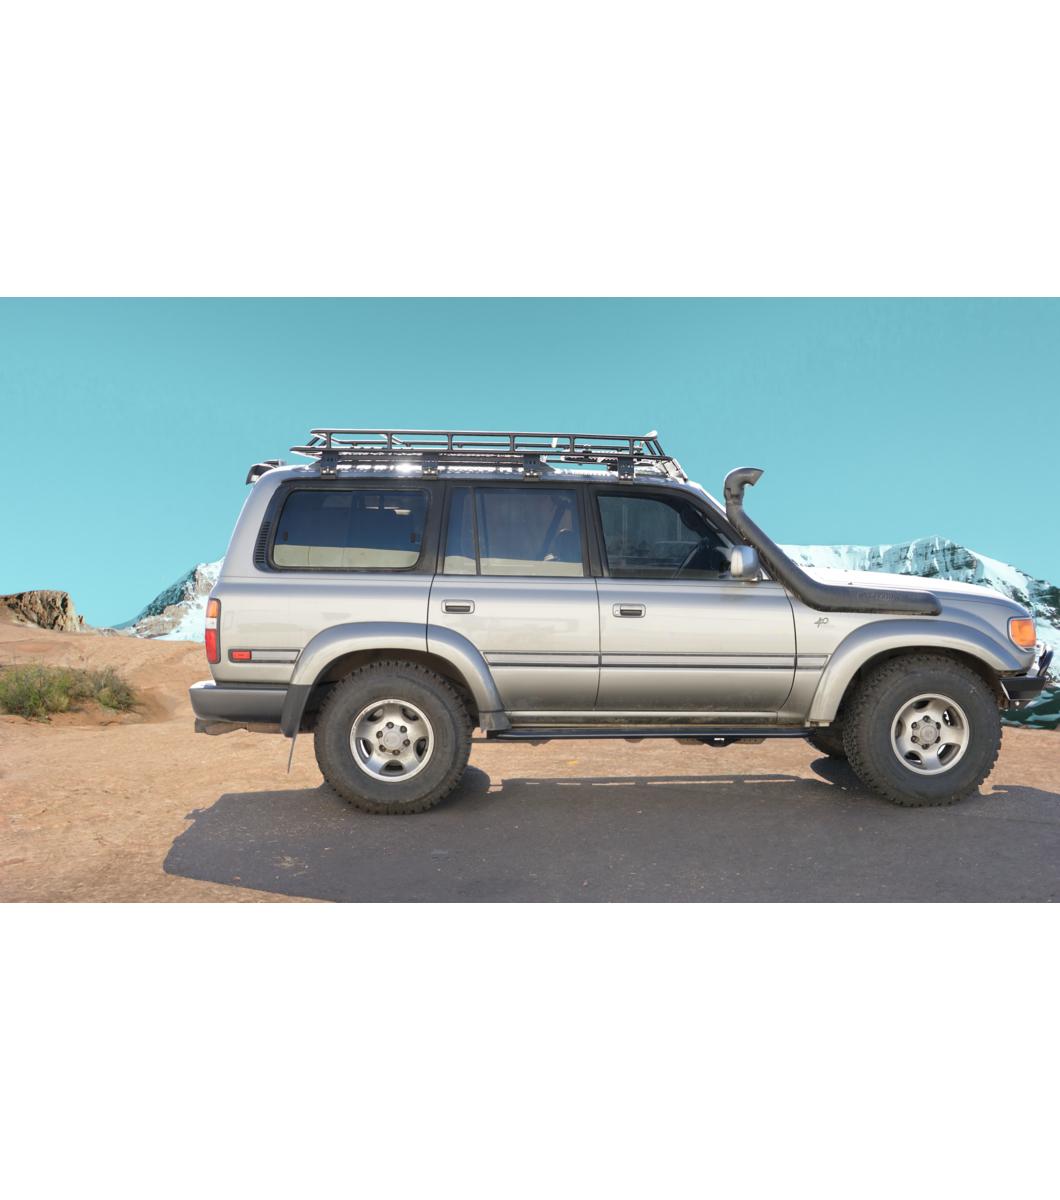 Beautiful Gobi Toyota Landcruiser 80 Ranger Roof Rack With Sunroof Opening